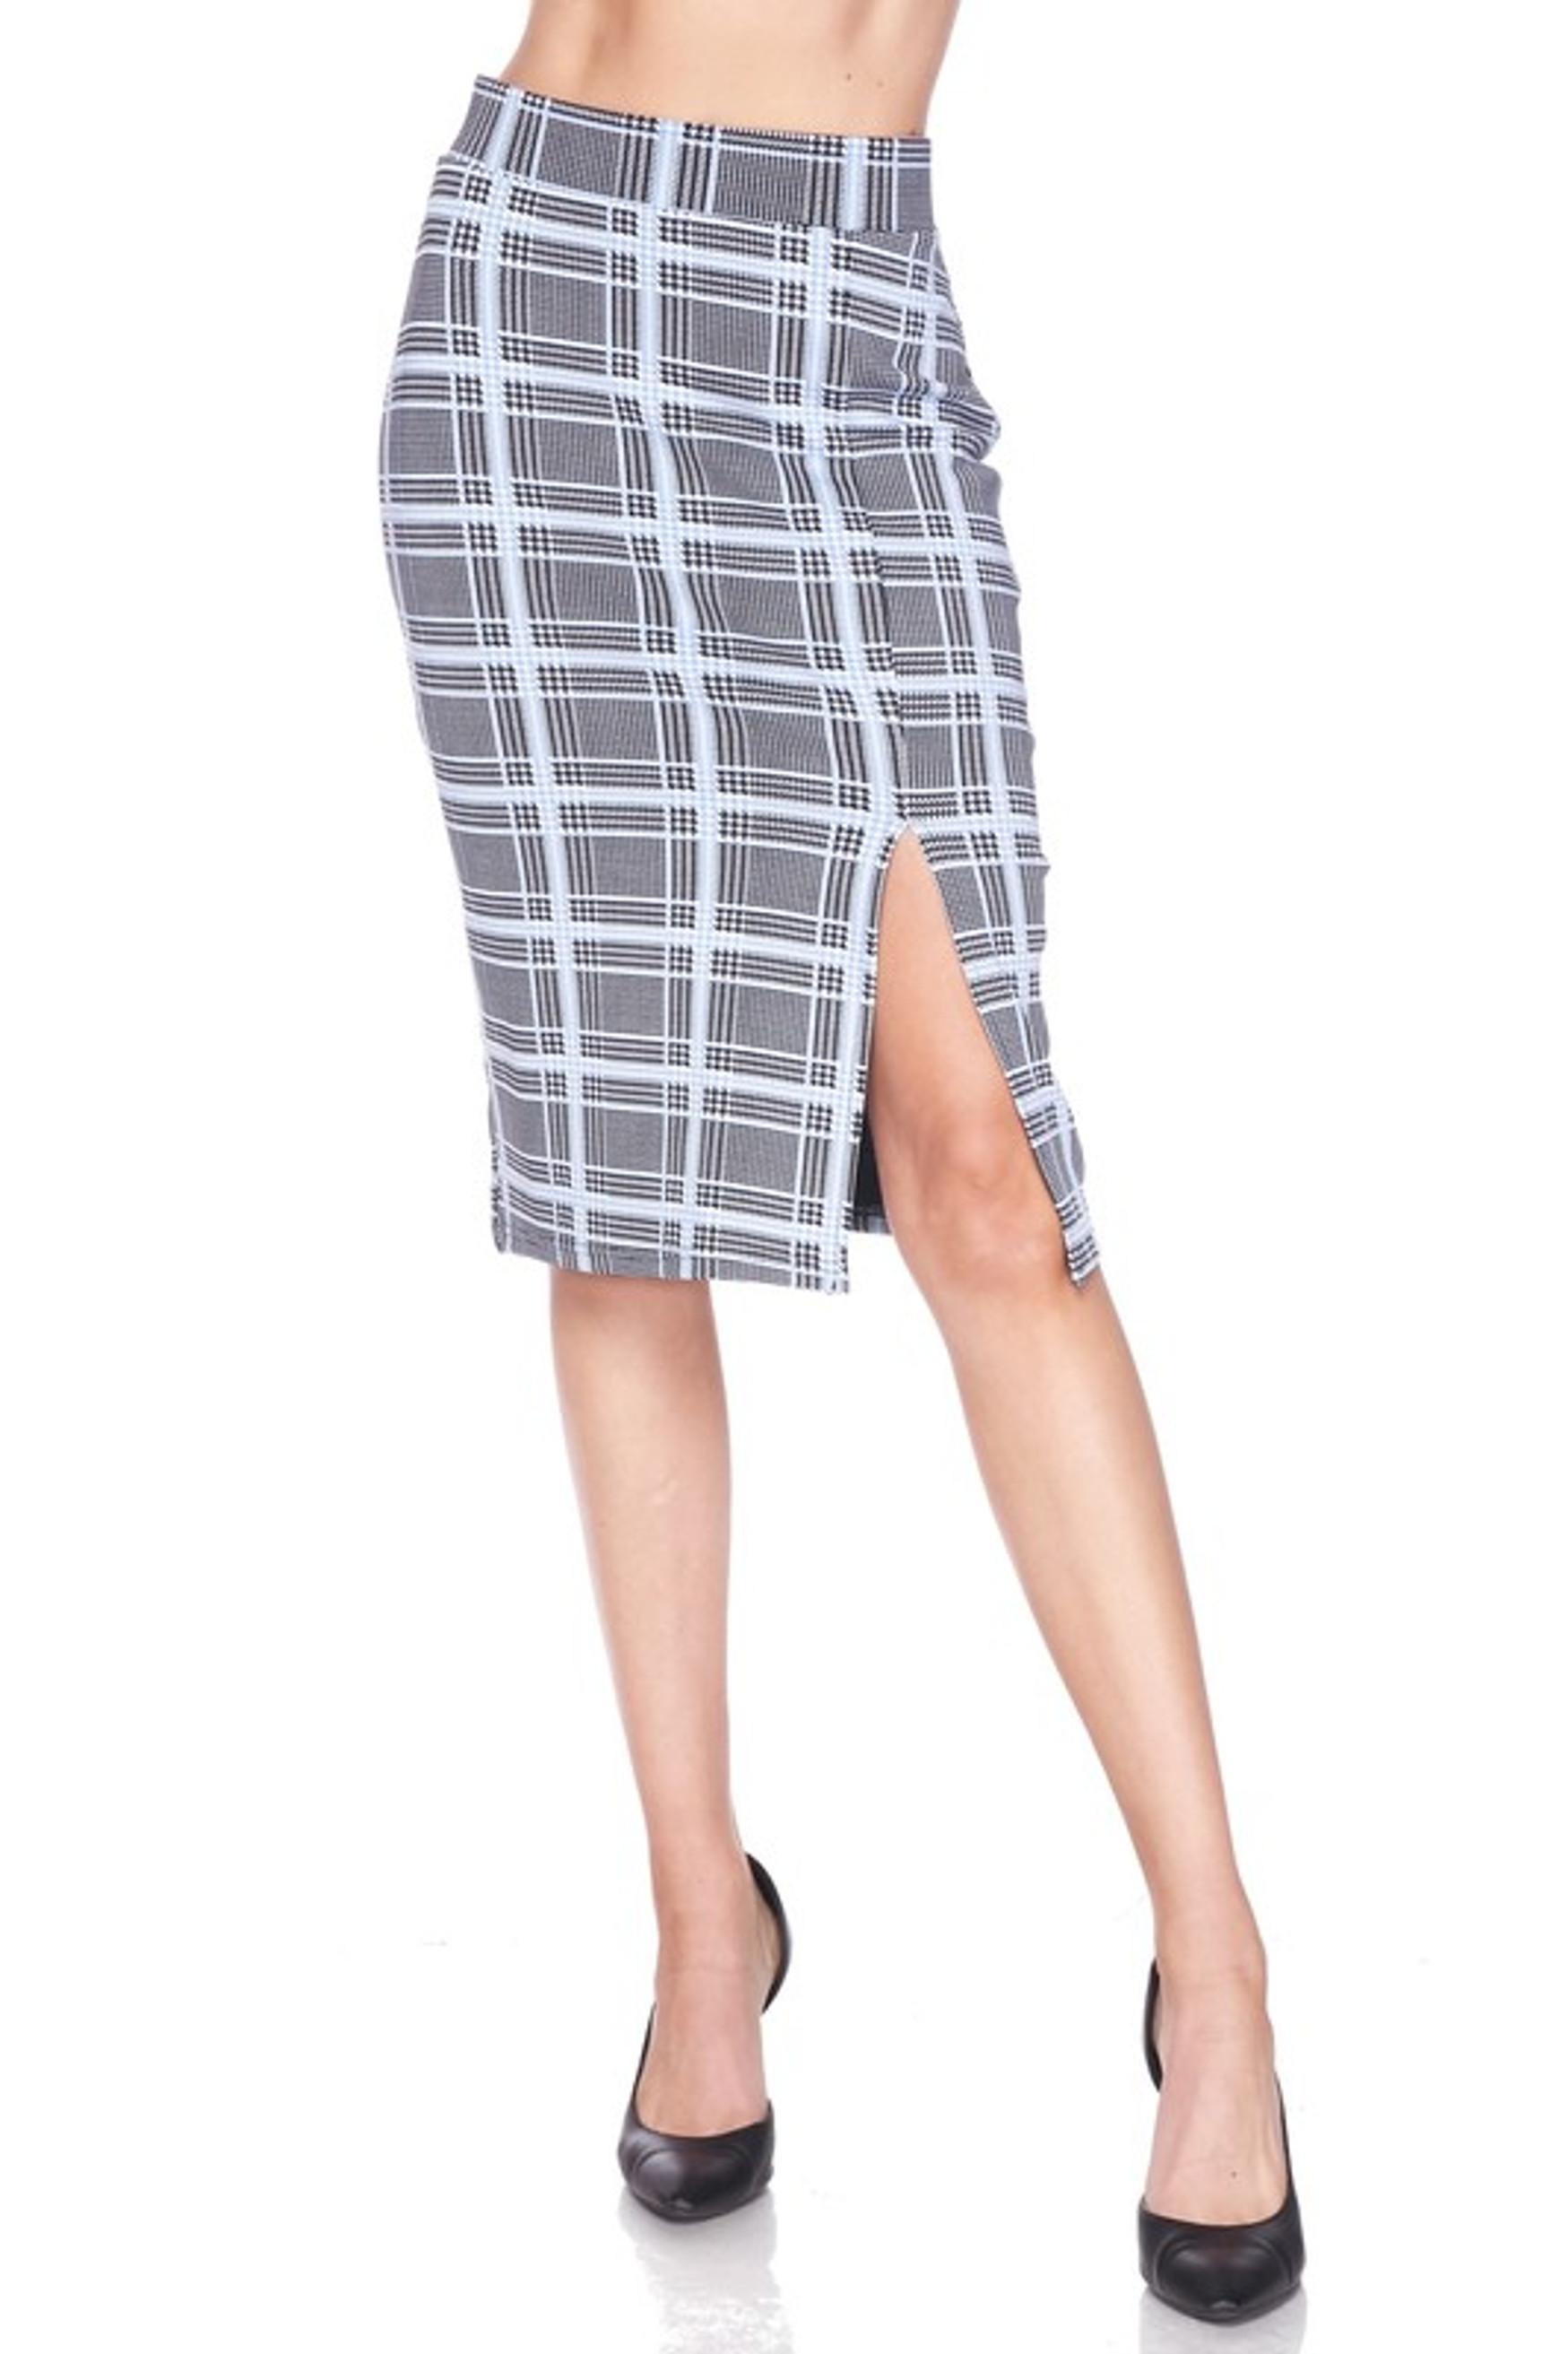 Silky Soft Scuba Baby Blue Glen Plaid Plus Size Pencil Skirt with Front Slit